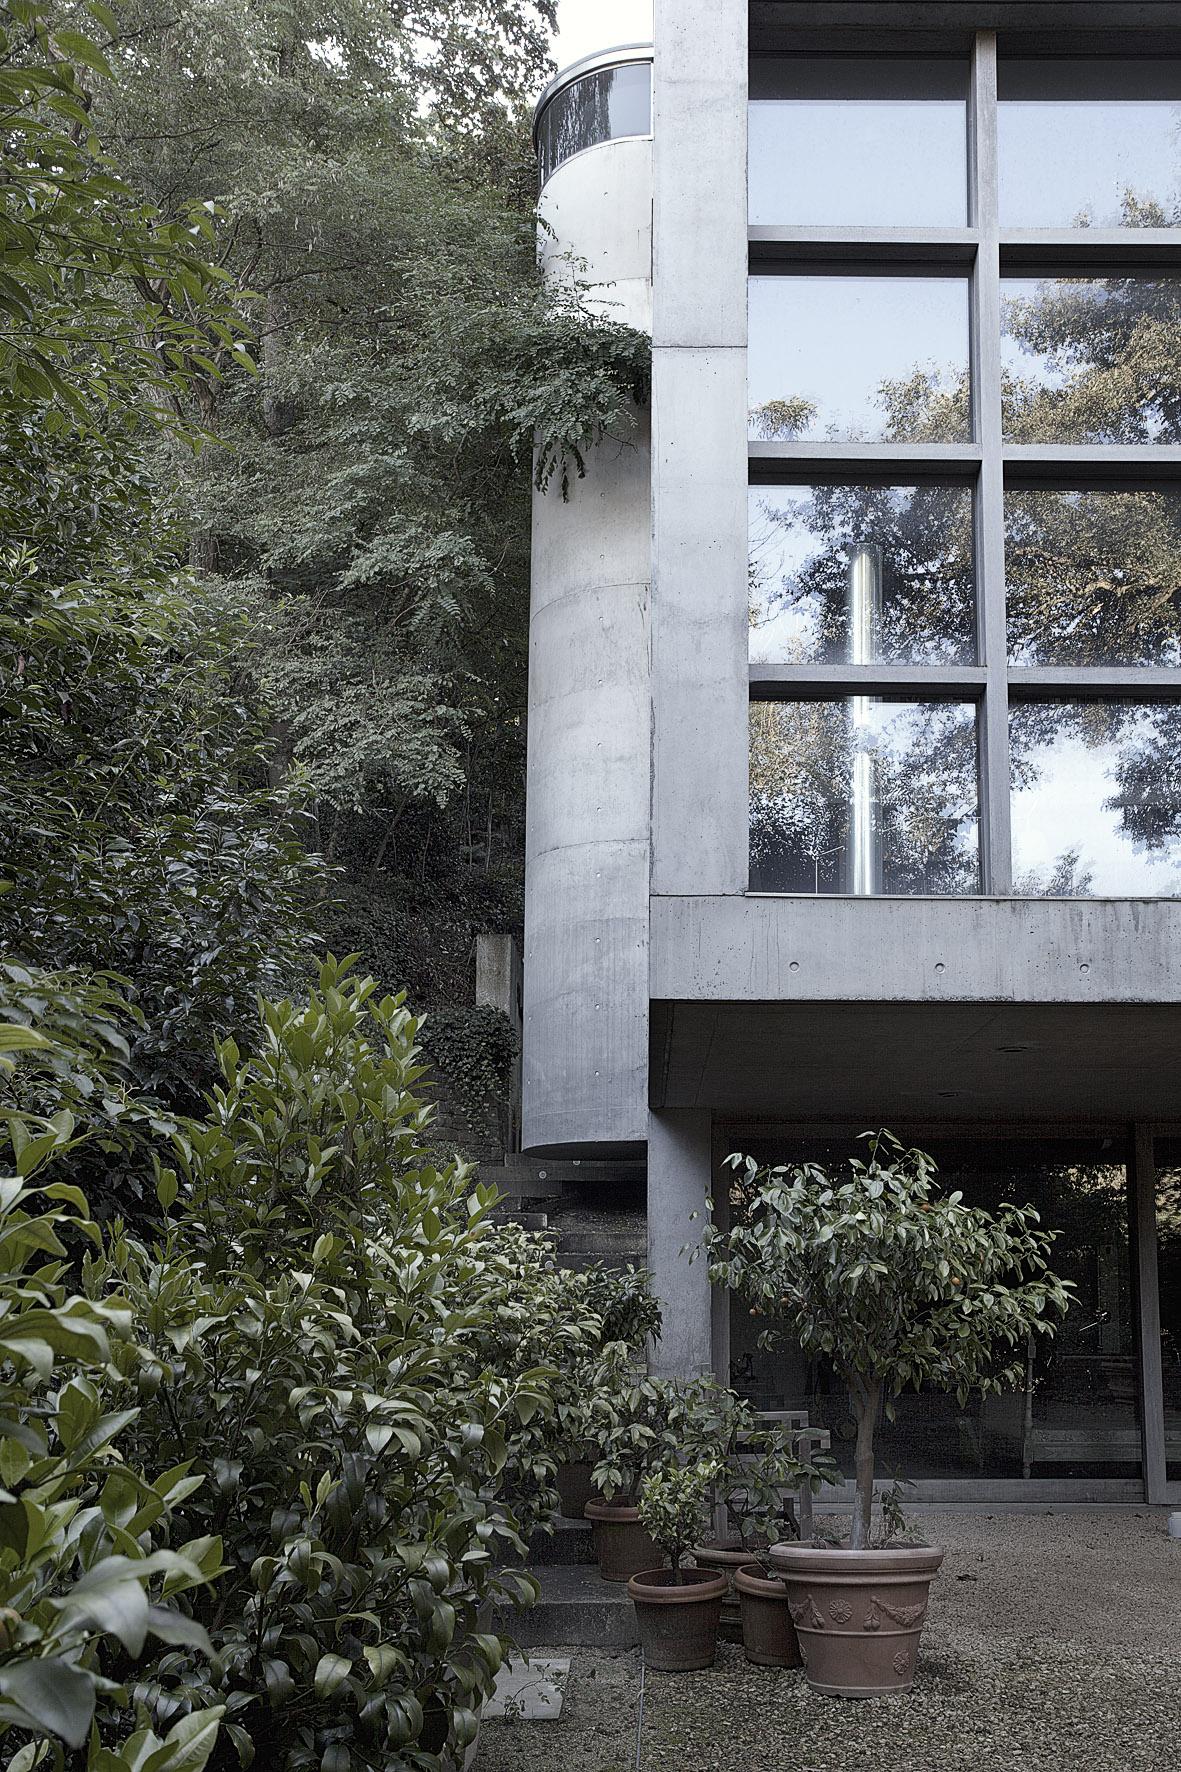 architecte_bruno_albert_serge_delsemme_photo_caroline_dethier_06.jpg